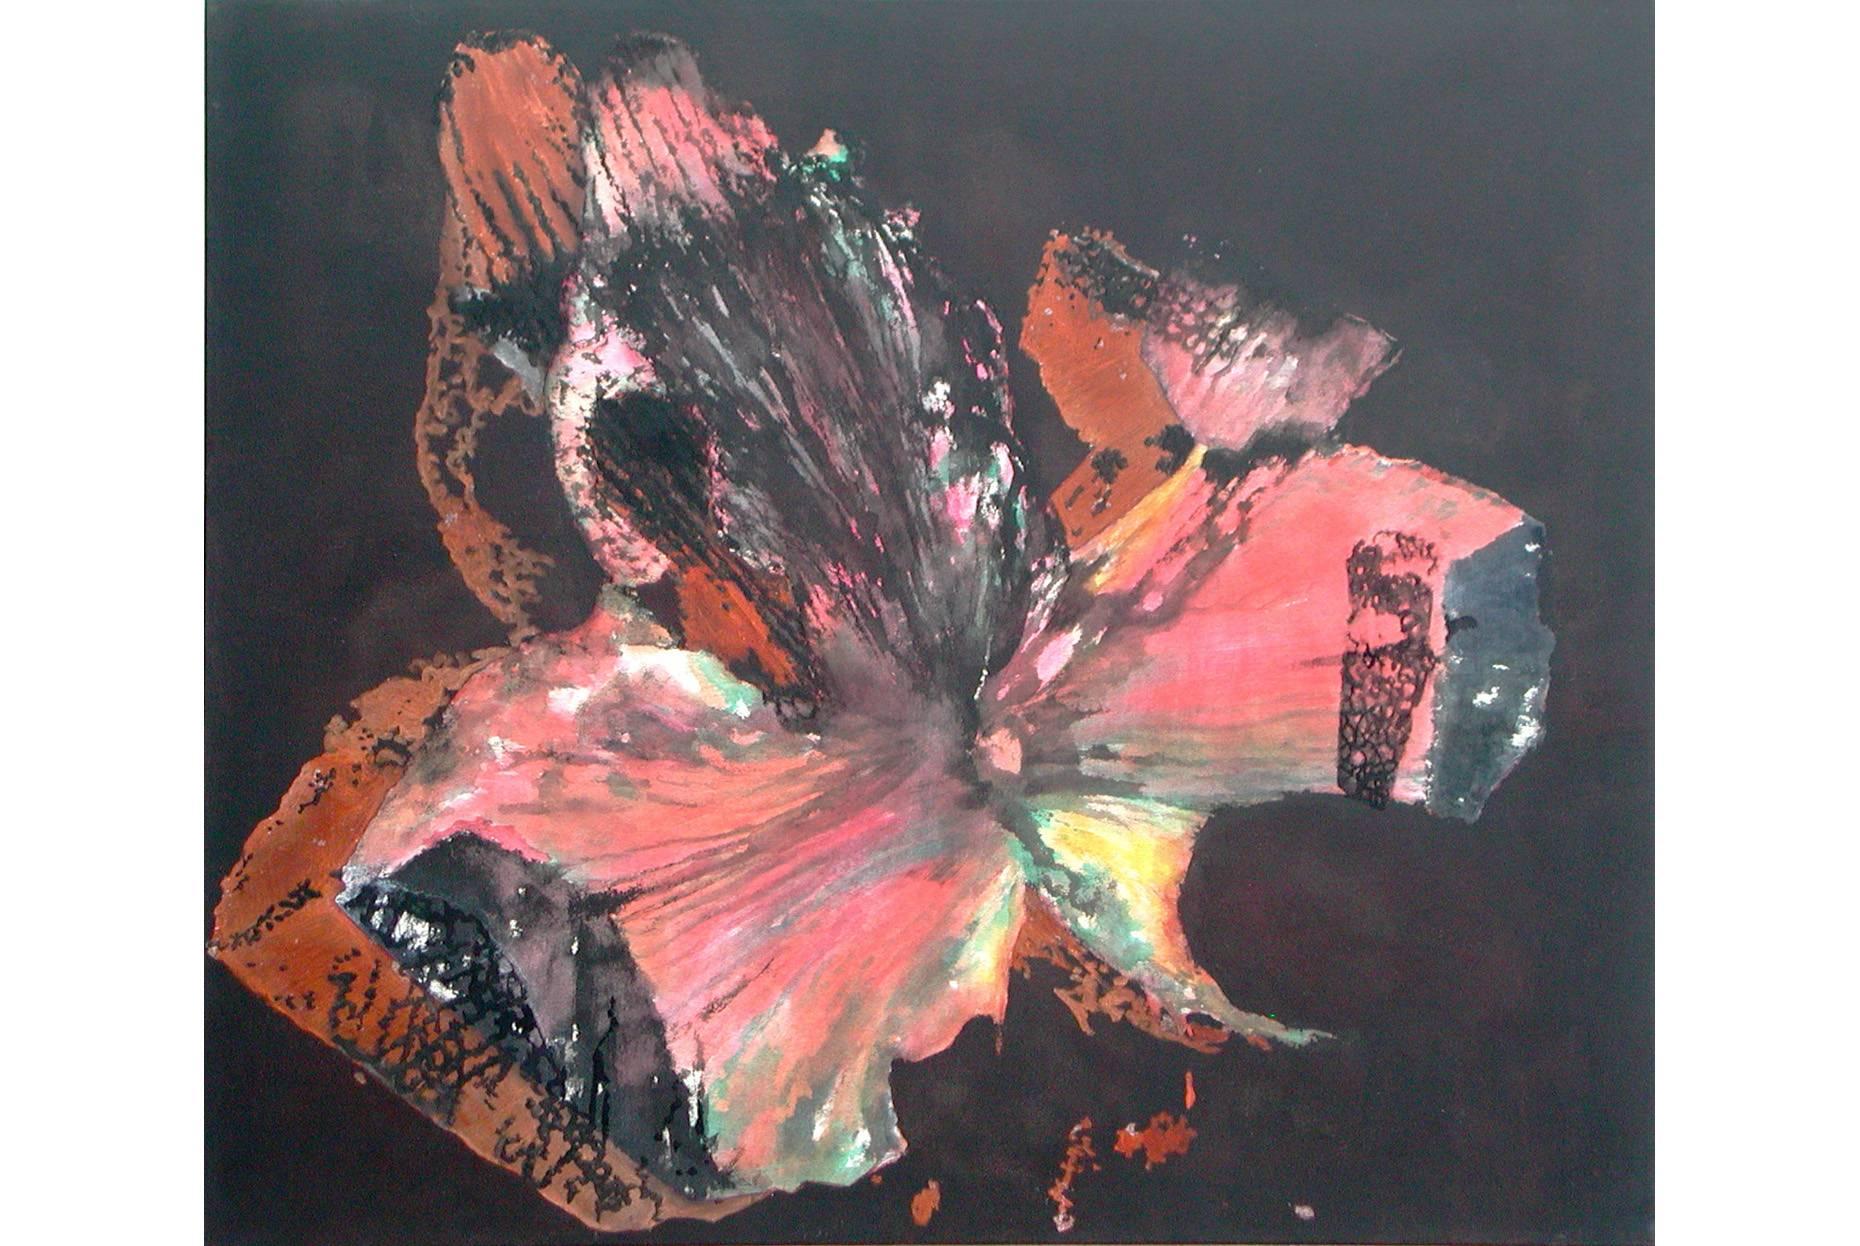 Amaryllis geschichtet I 2002 Aquarell- und Acrylfarbe a/Nessel 90 x 105 cm